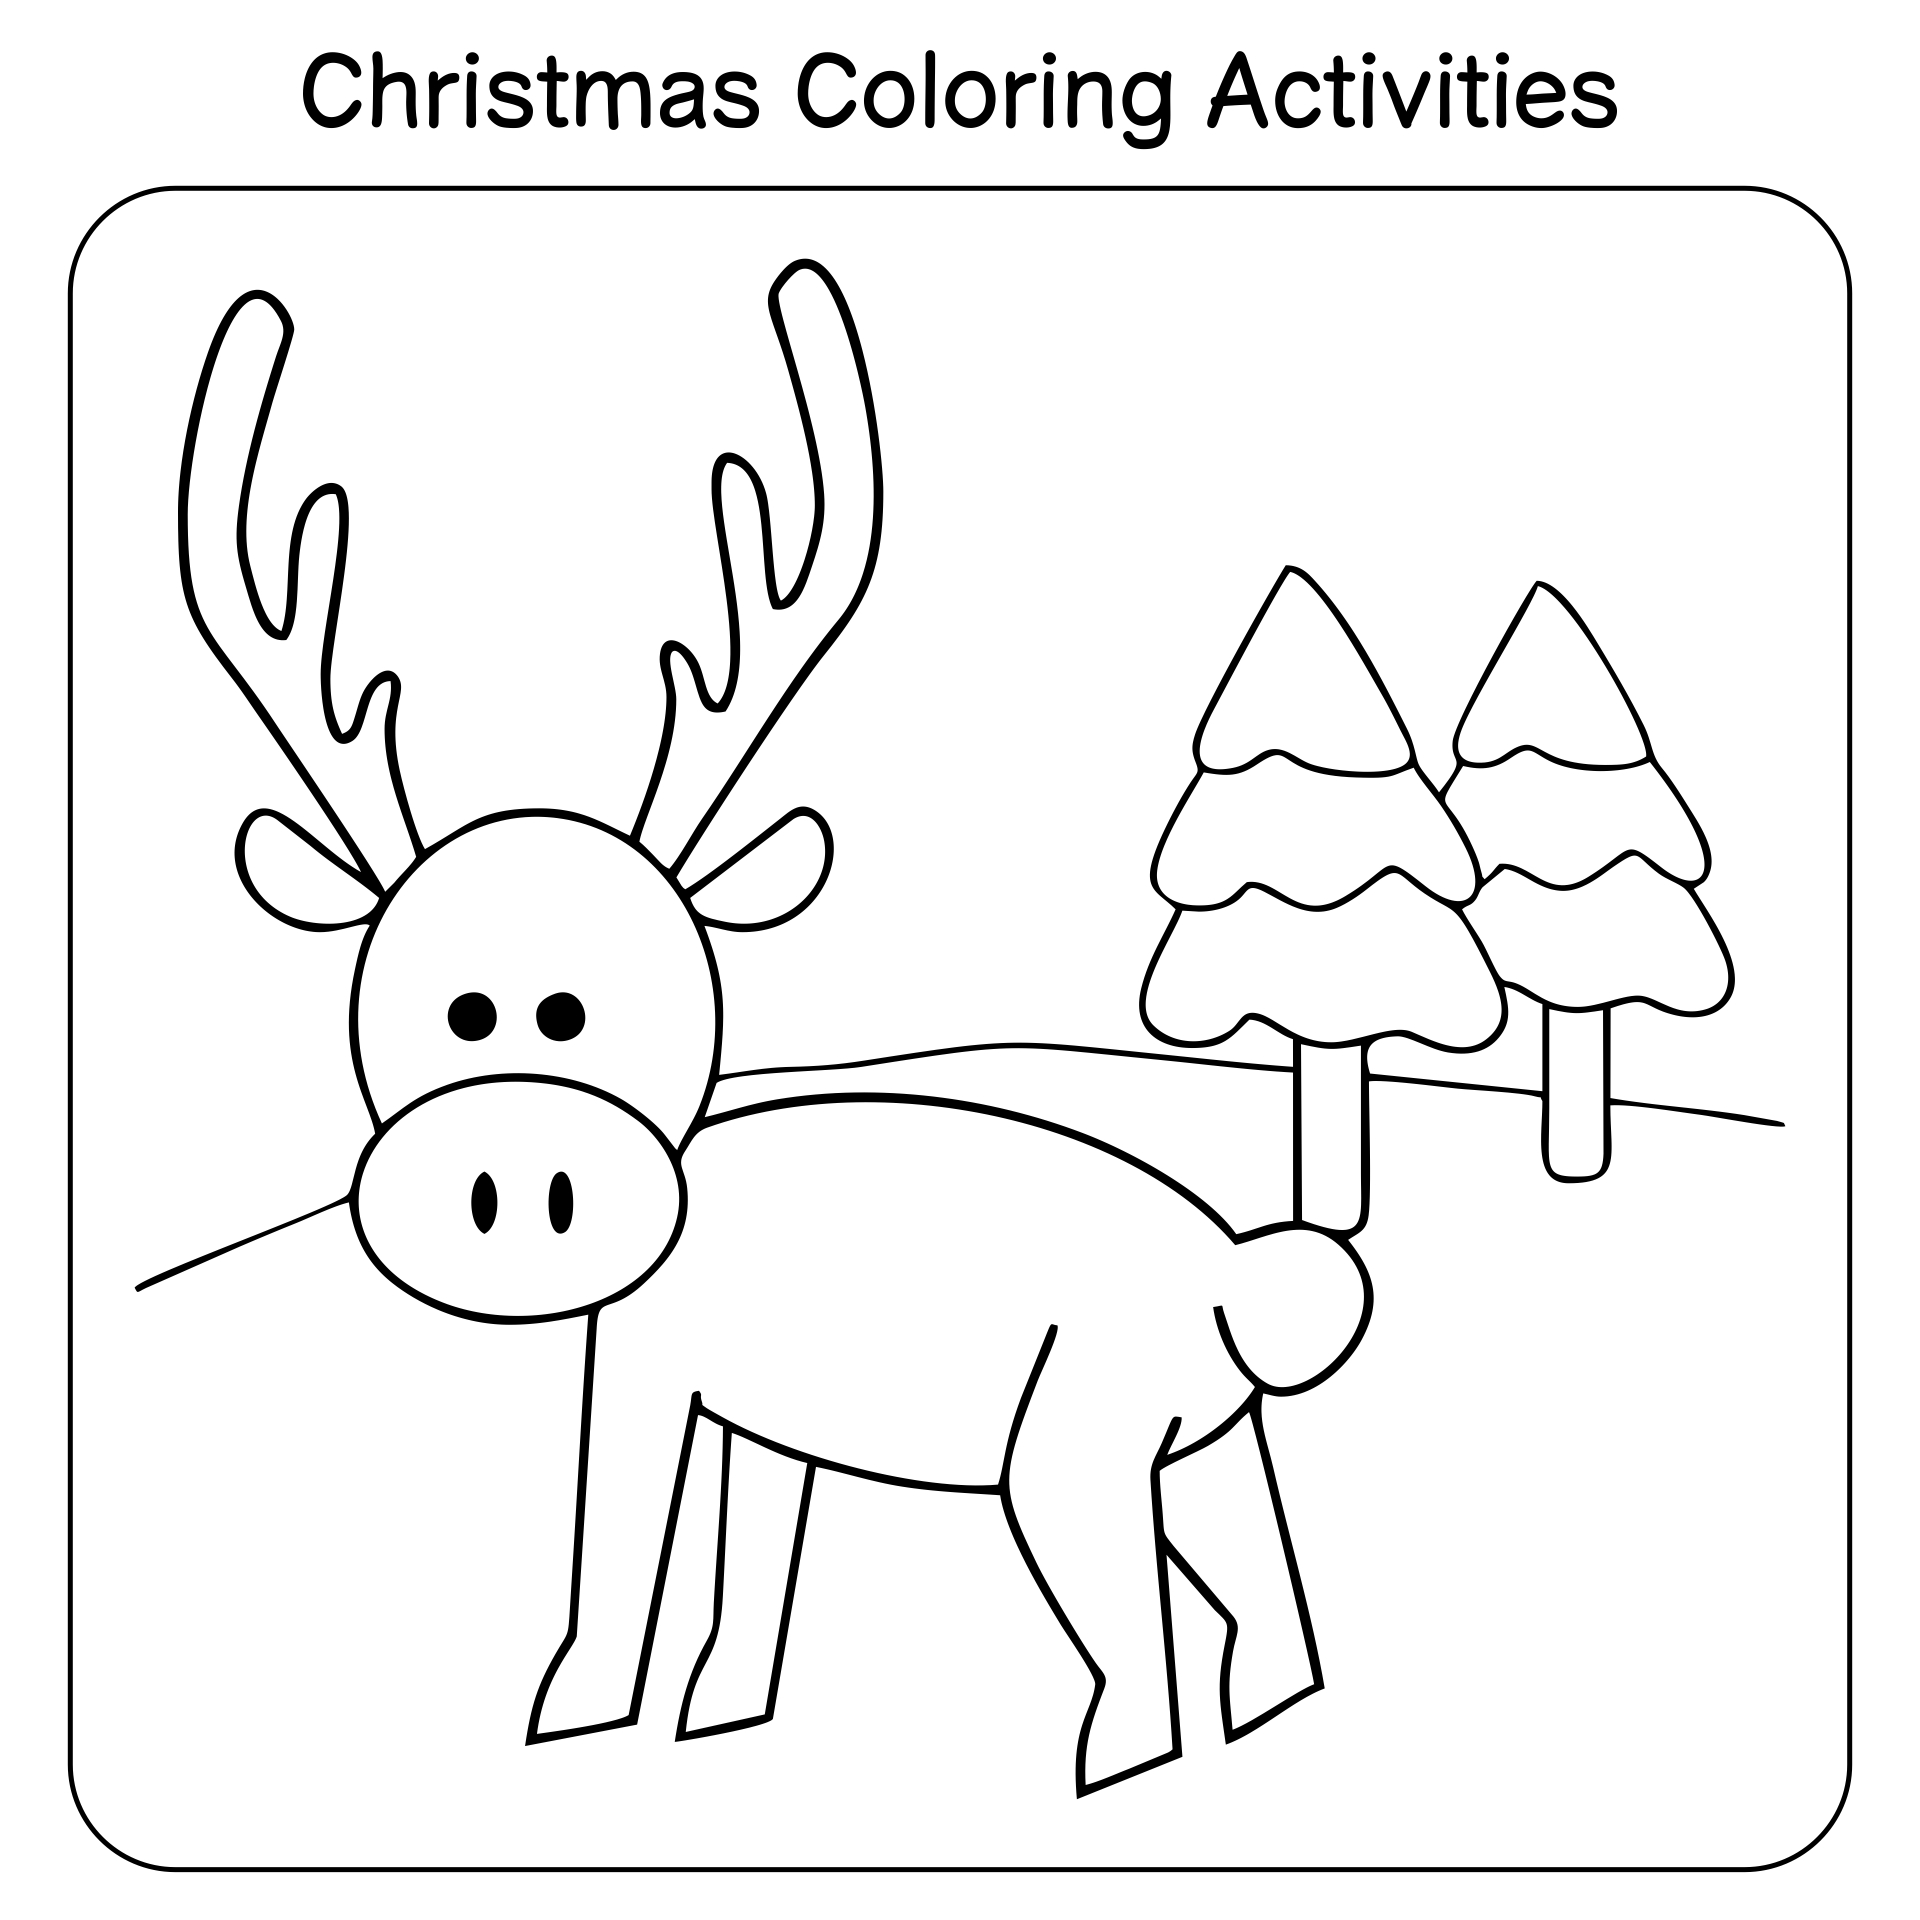 6 Images of Free Preschool Christmas Activities Printables